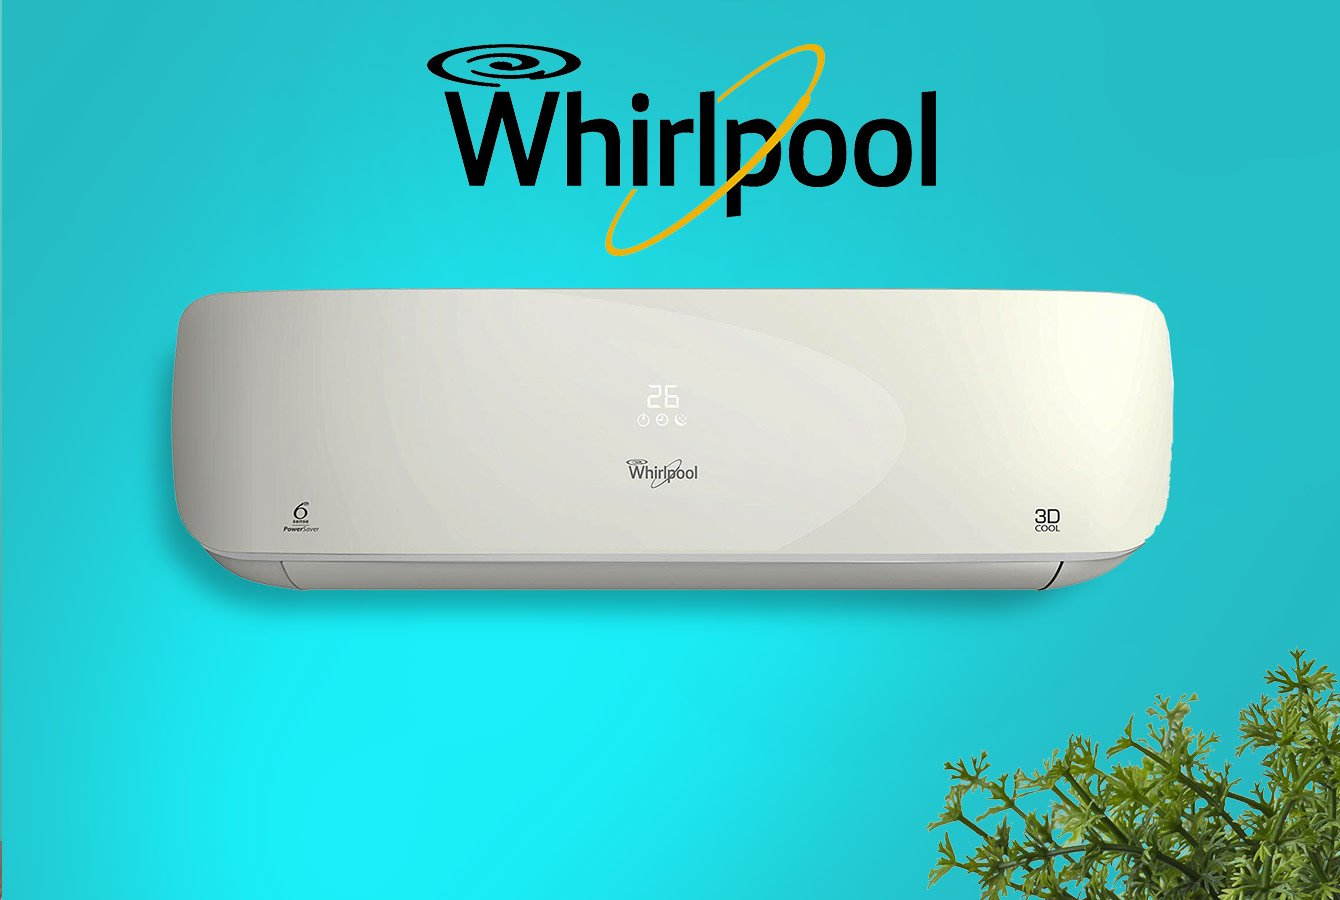 Whirlpool ACs